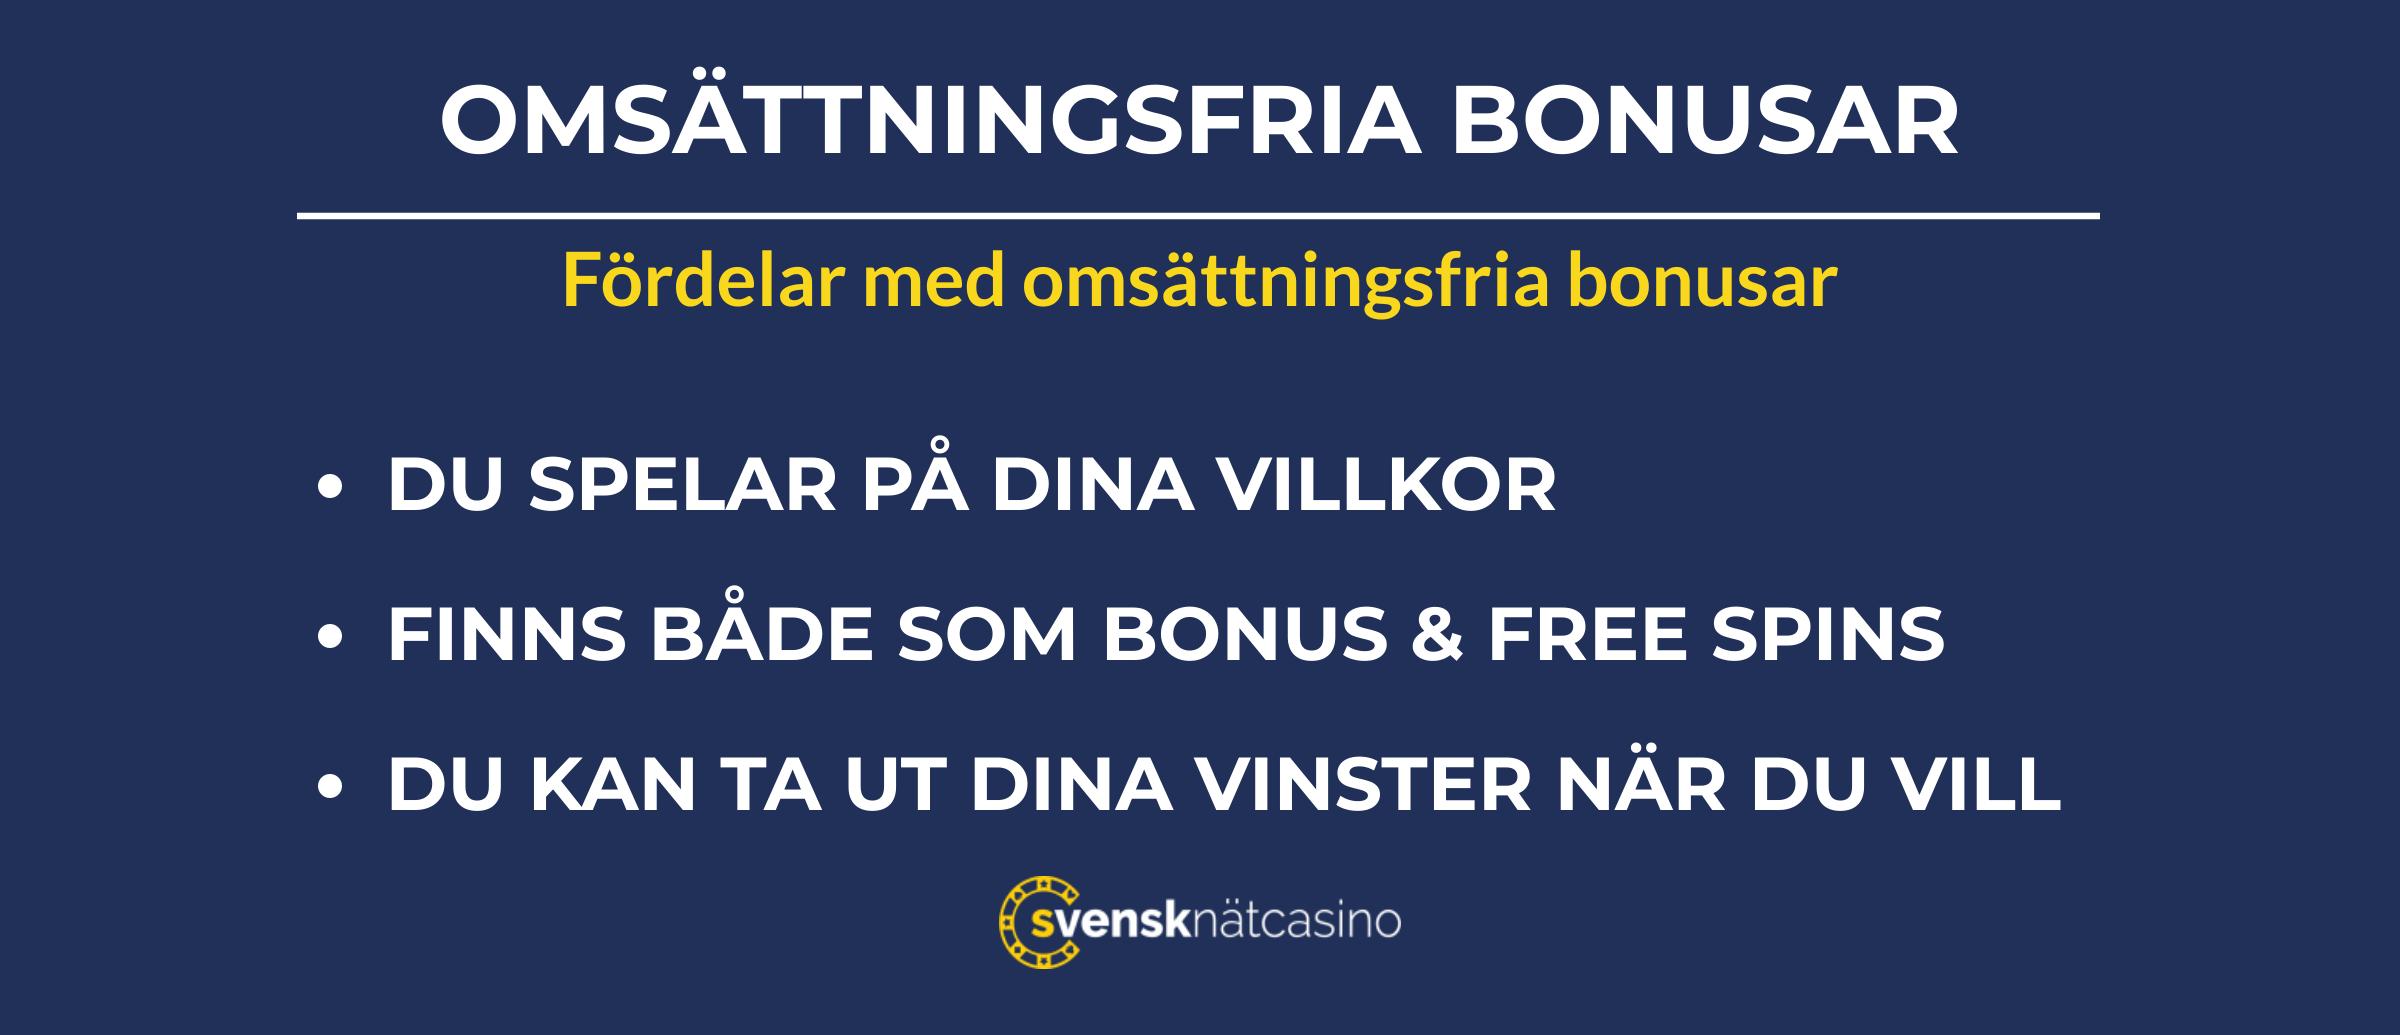 fordelar med omsattningsfria bonusar svensknatcasino se